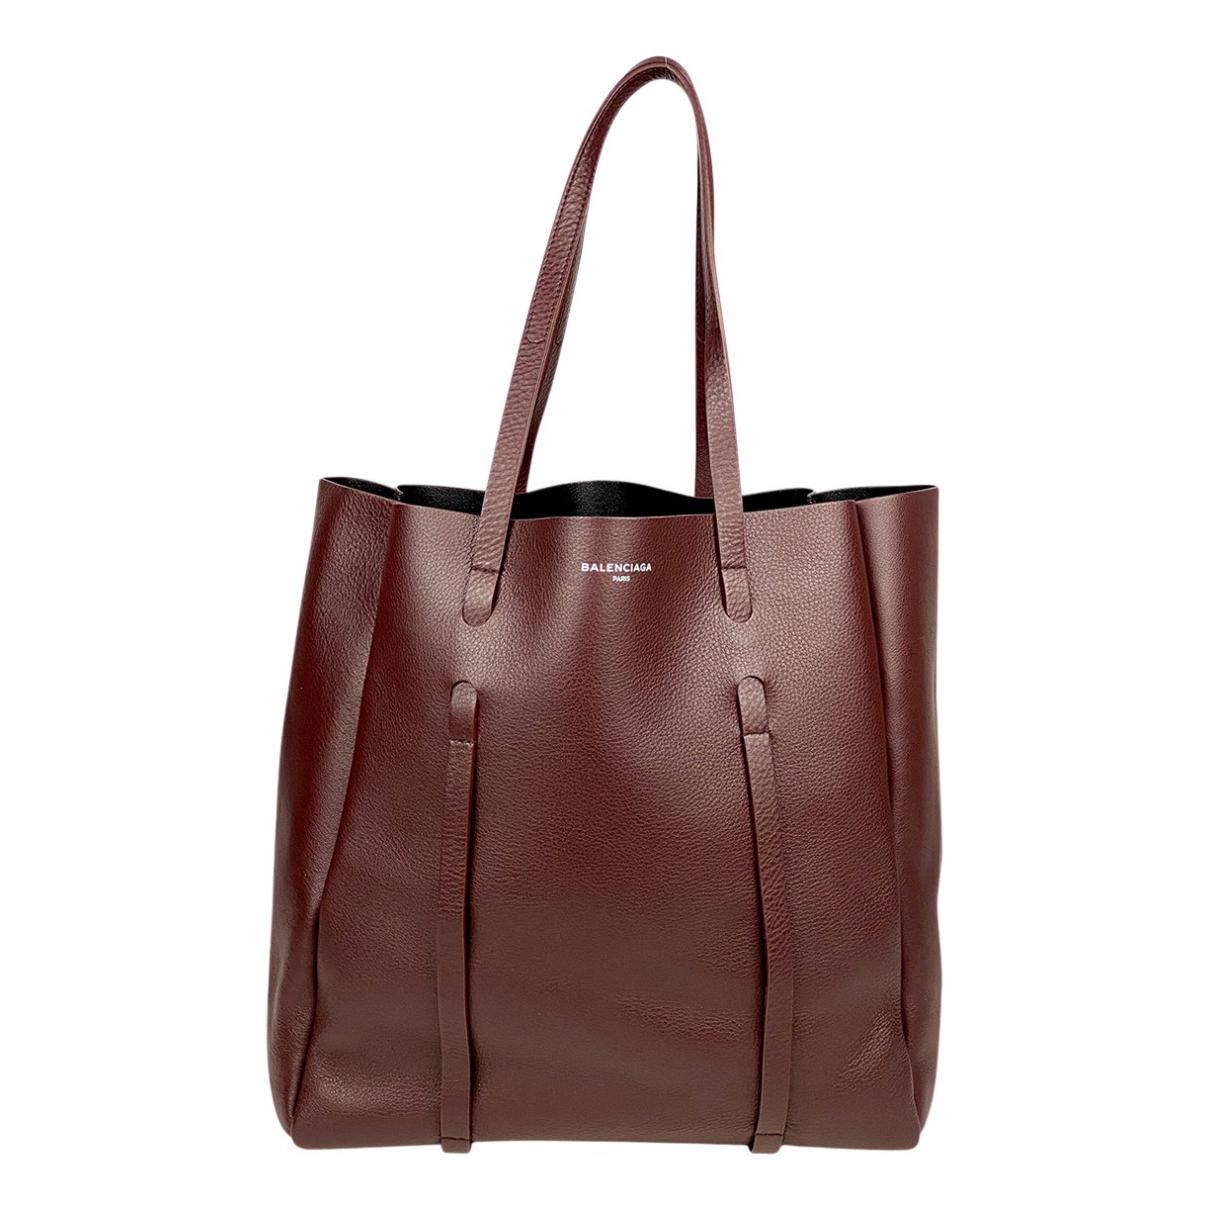 Balenciaga - Sac a main Eveyday Cabas pour femme en cuir - bordeaux